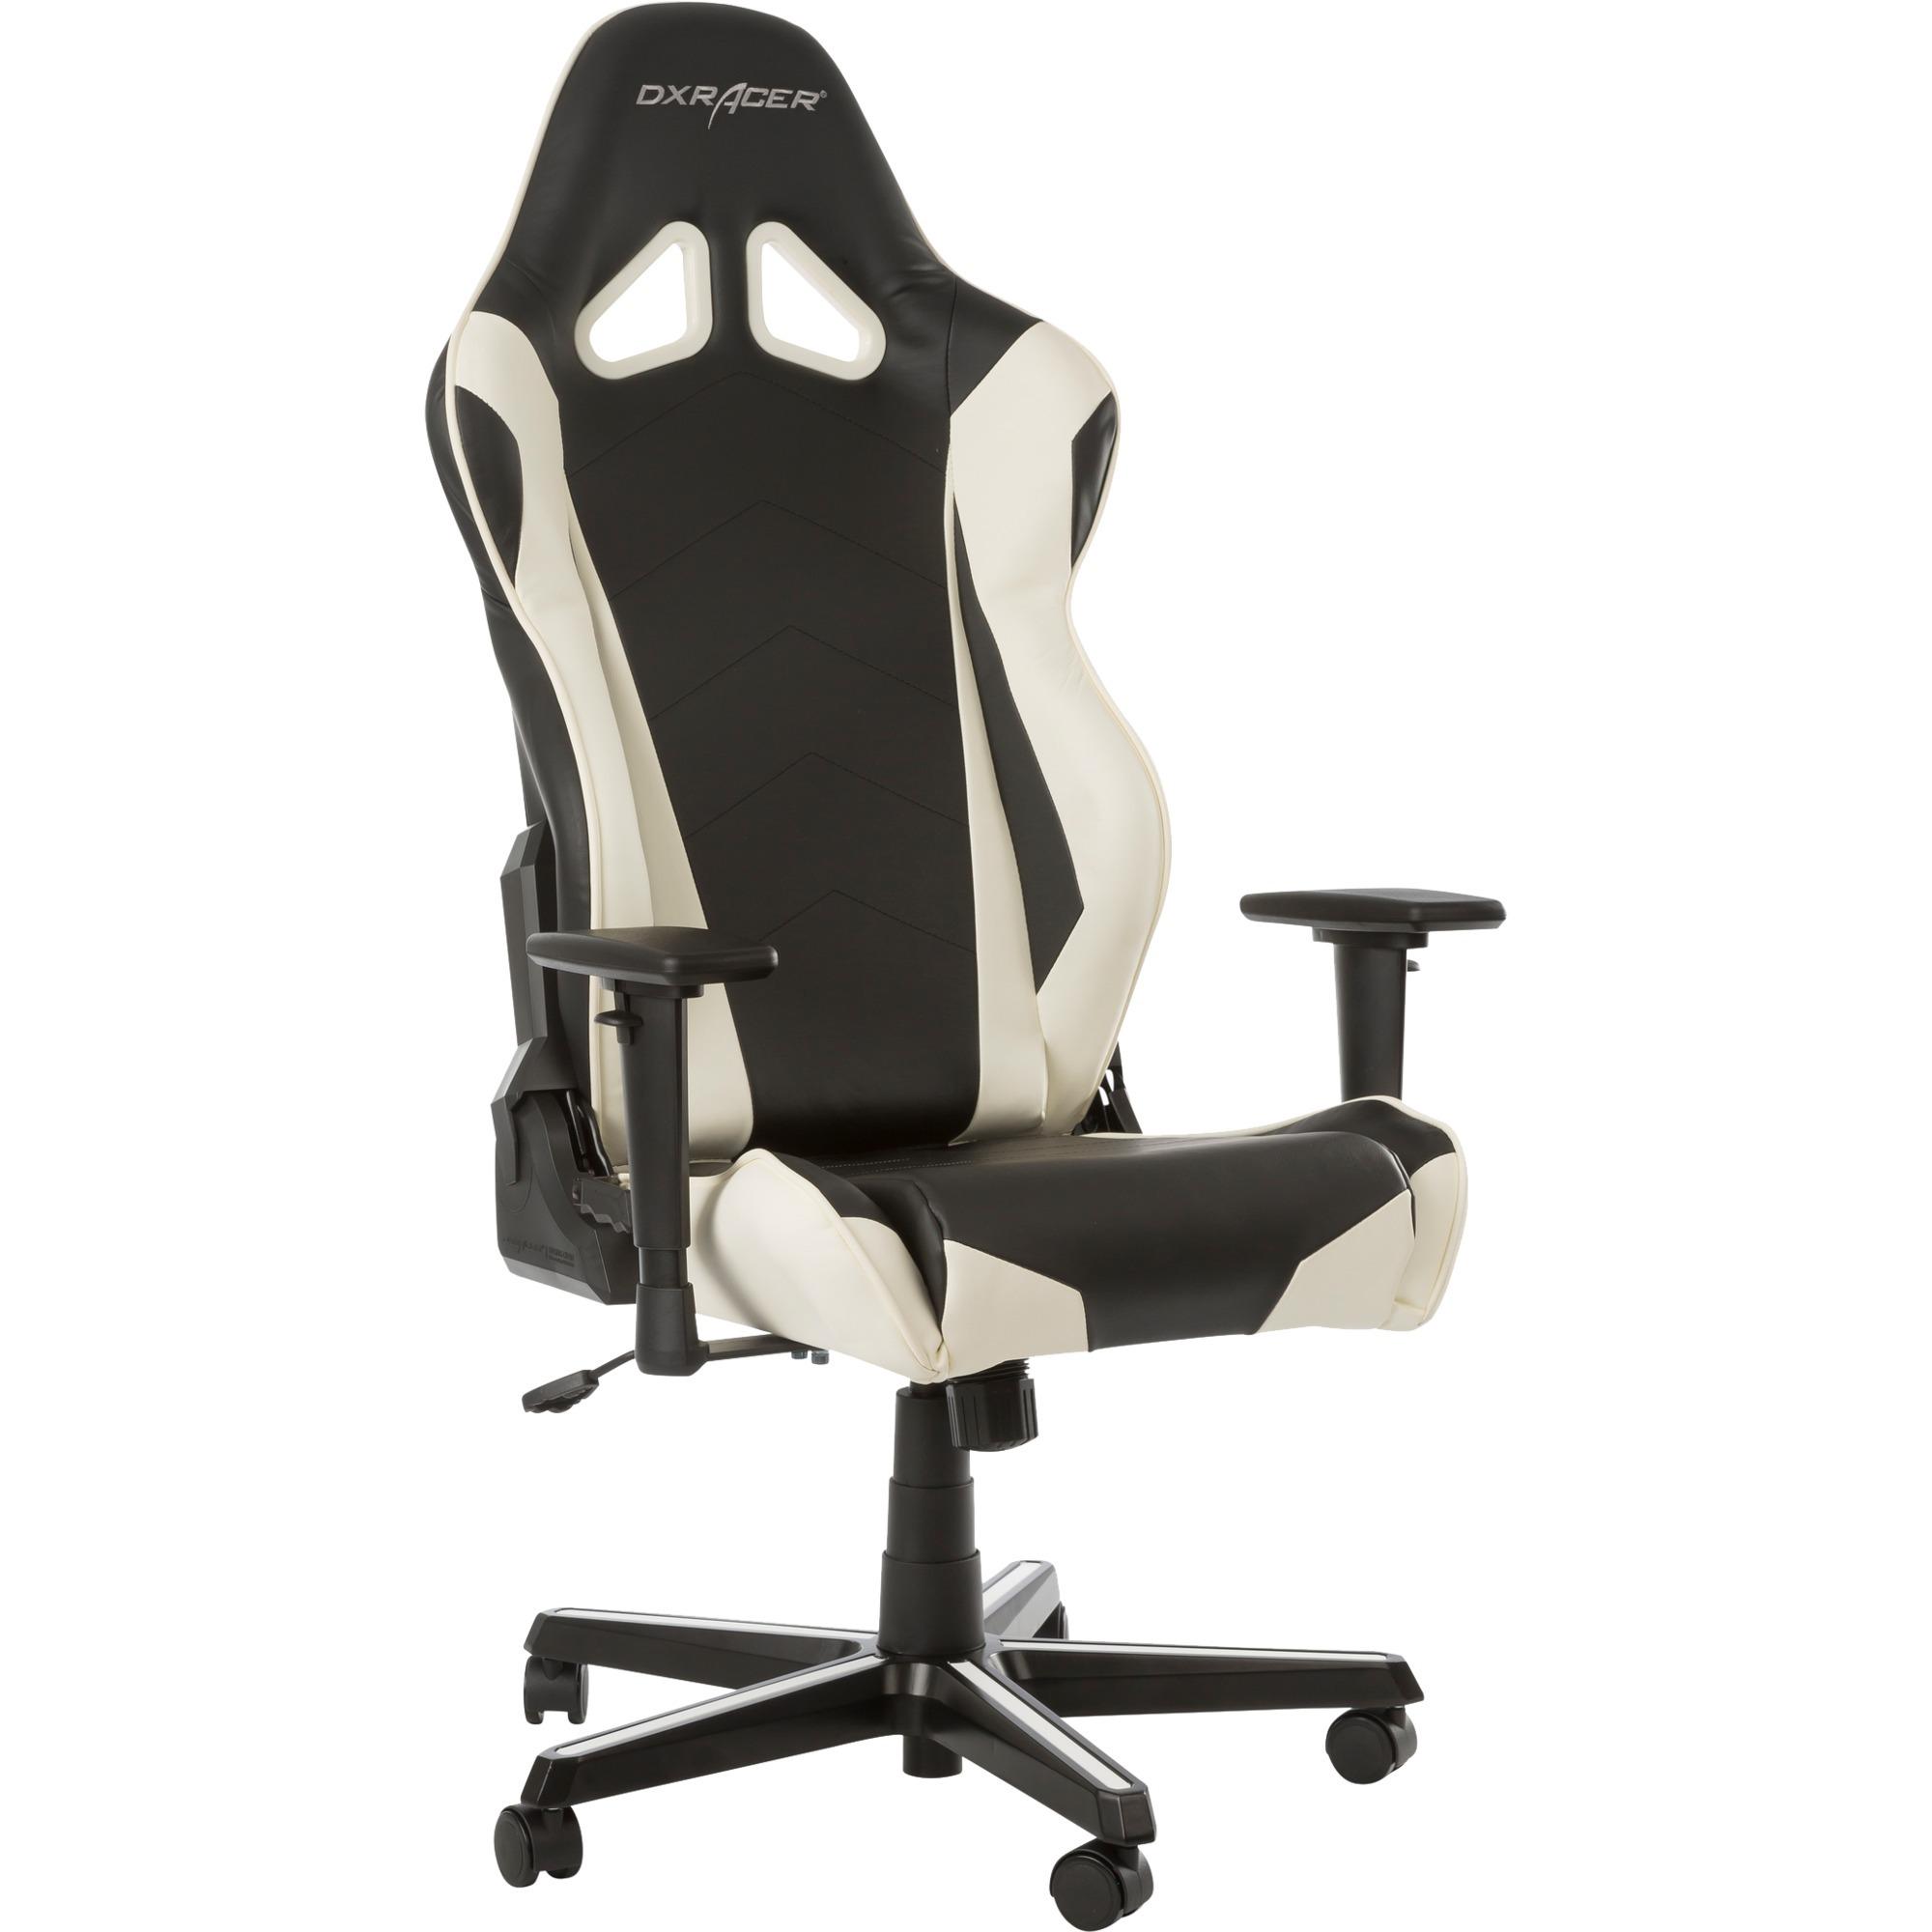 Racing Gaming Chair, Siège de jeu